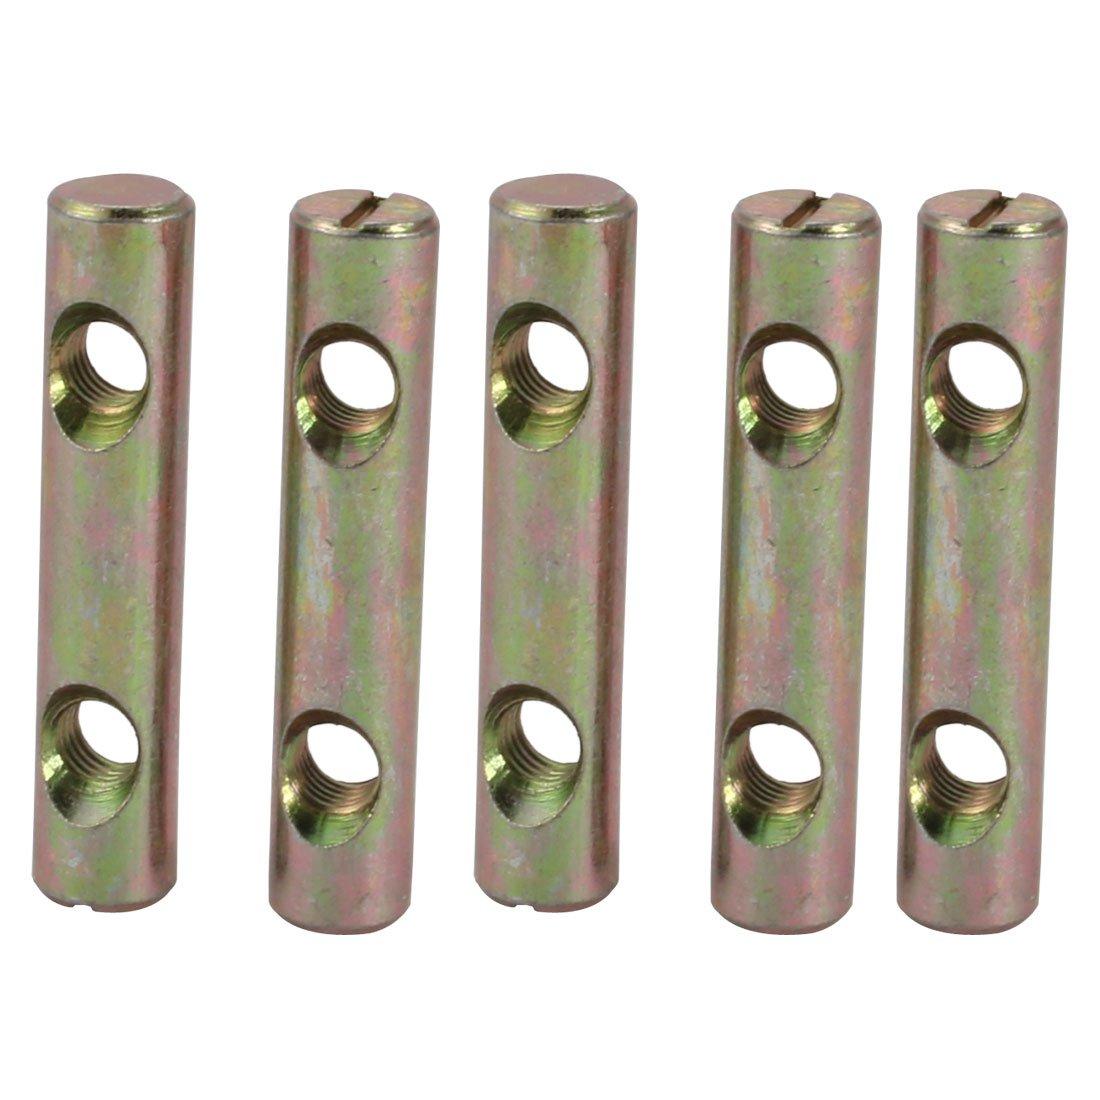 uxcell 5pcs M8x60mm Dual Hole Zinc Plated Iron Slotted Drive Cross Dowel Barrel Nut